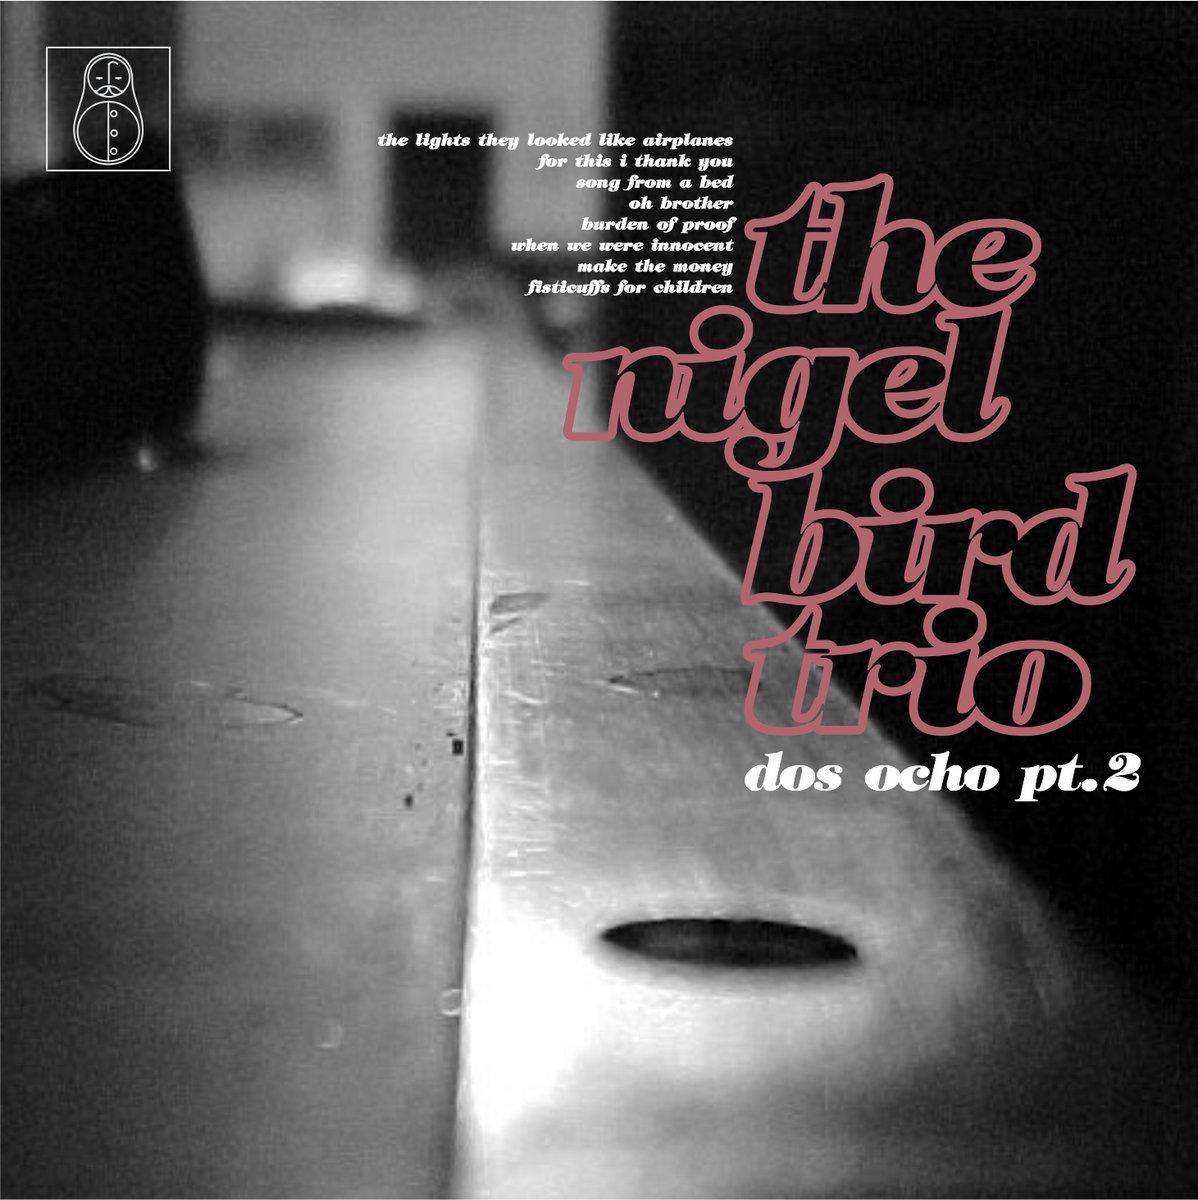 fisticuffs for children the nigel bird trio